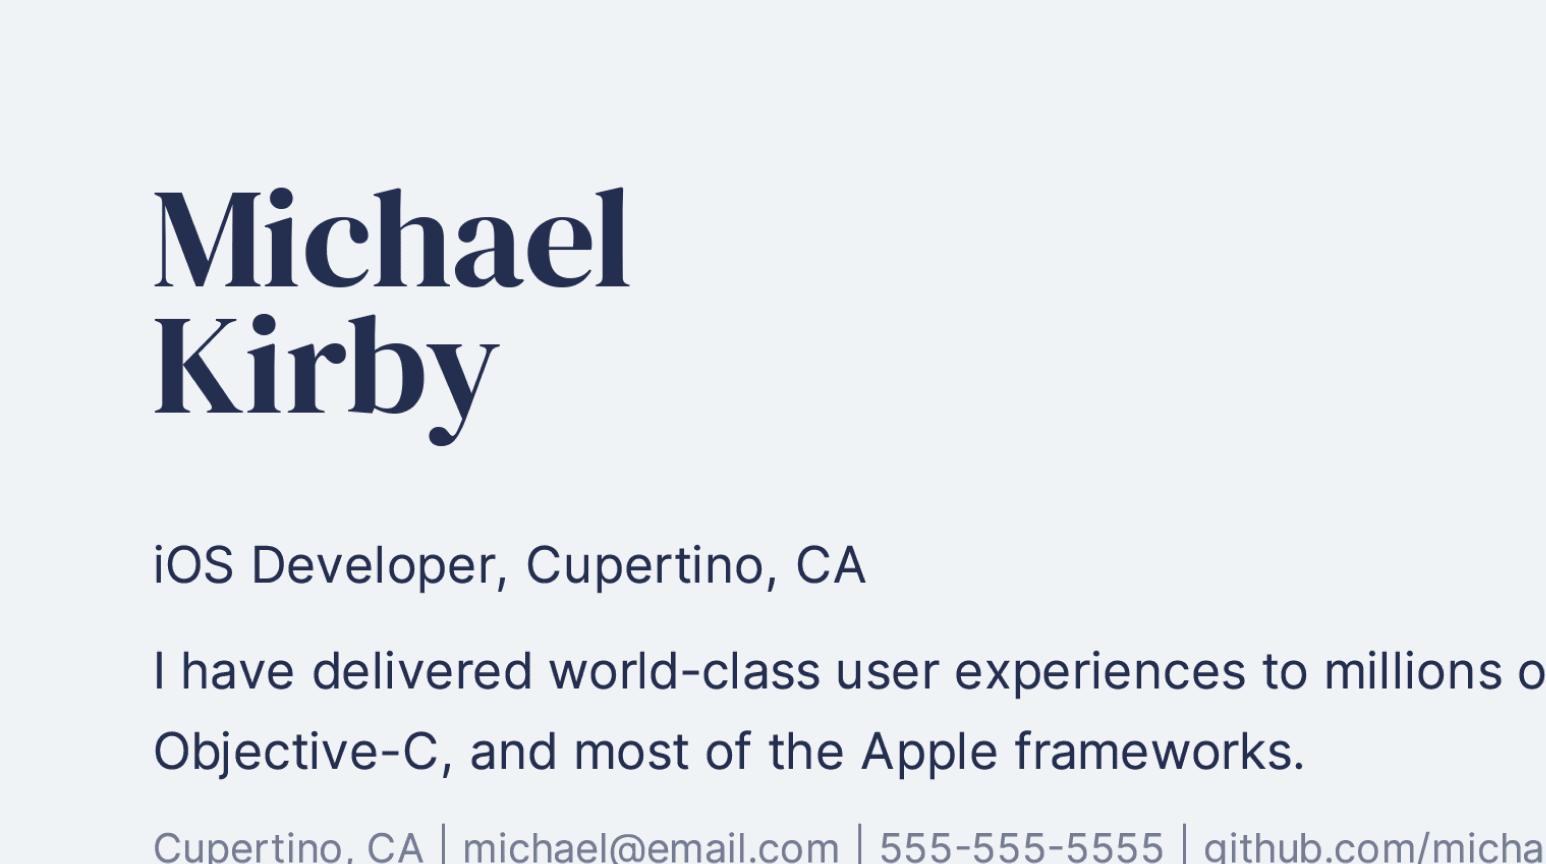 Design details of creative iOS Developer resume sample.